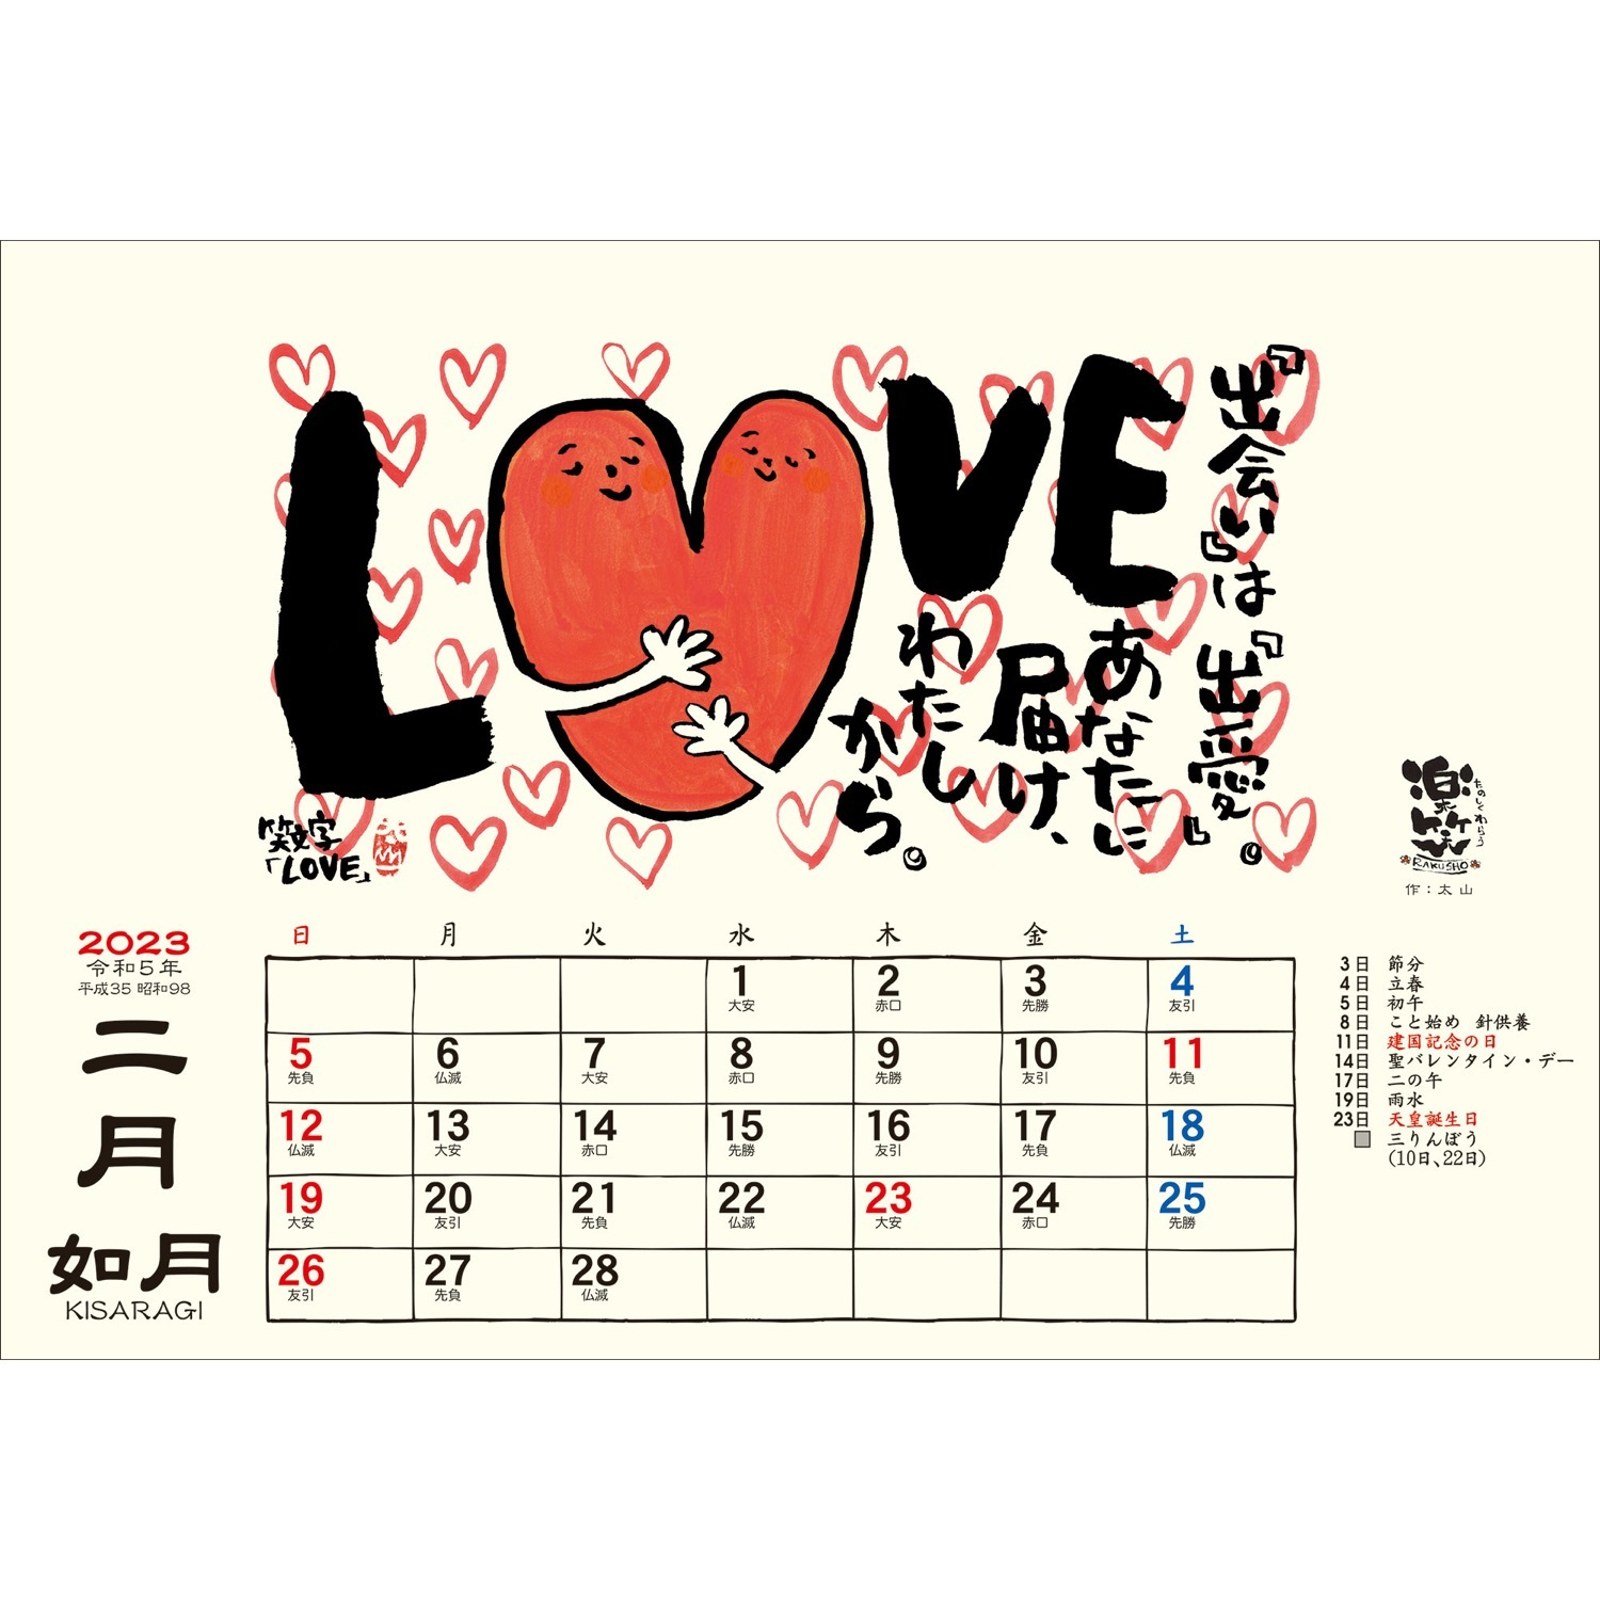 TD-30268(2022年版)<br>卓上L・楽笑<br>~笑顔になれる書画ごよみ~<br>【クリックポスト対応/代引き不可】